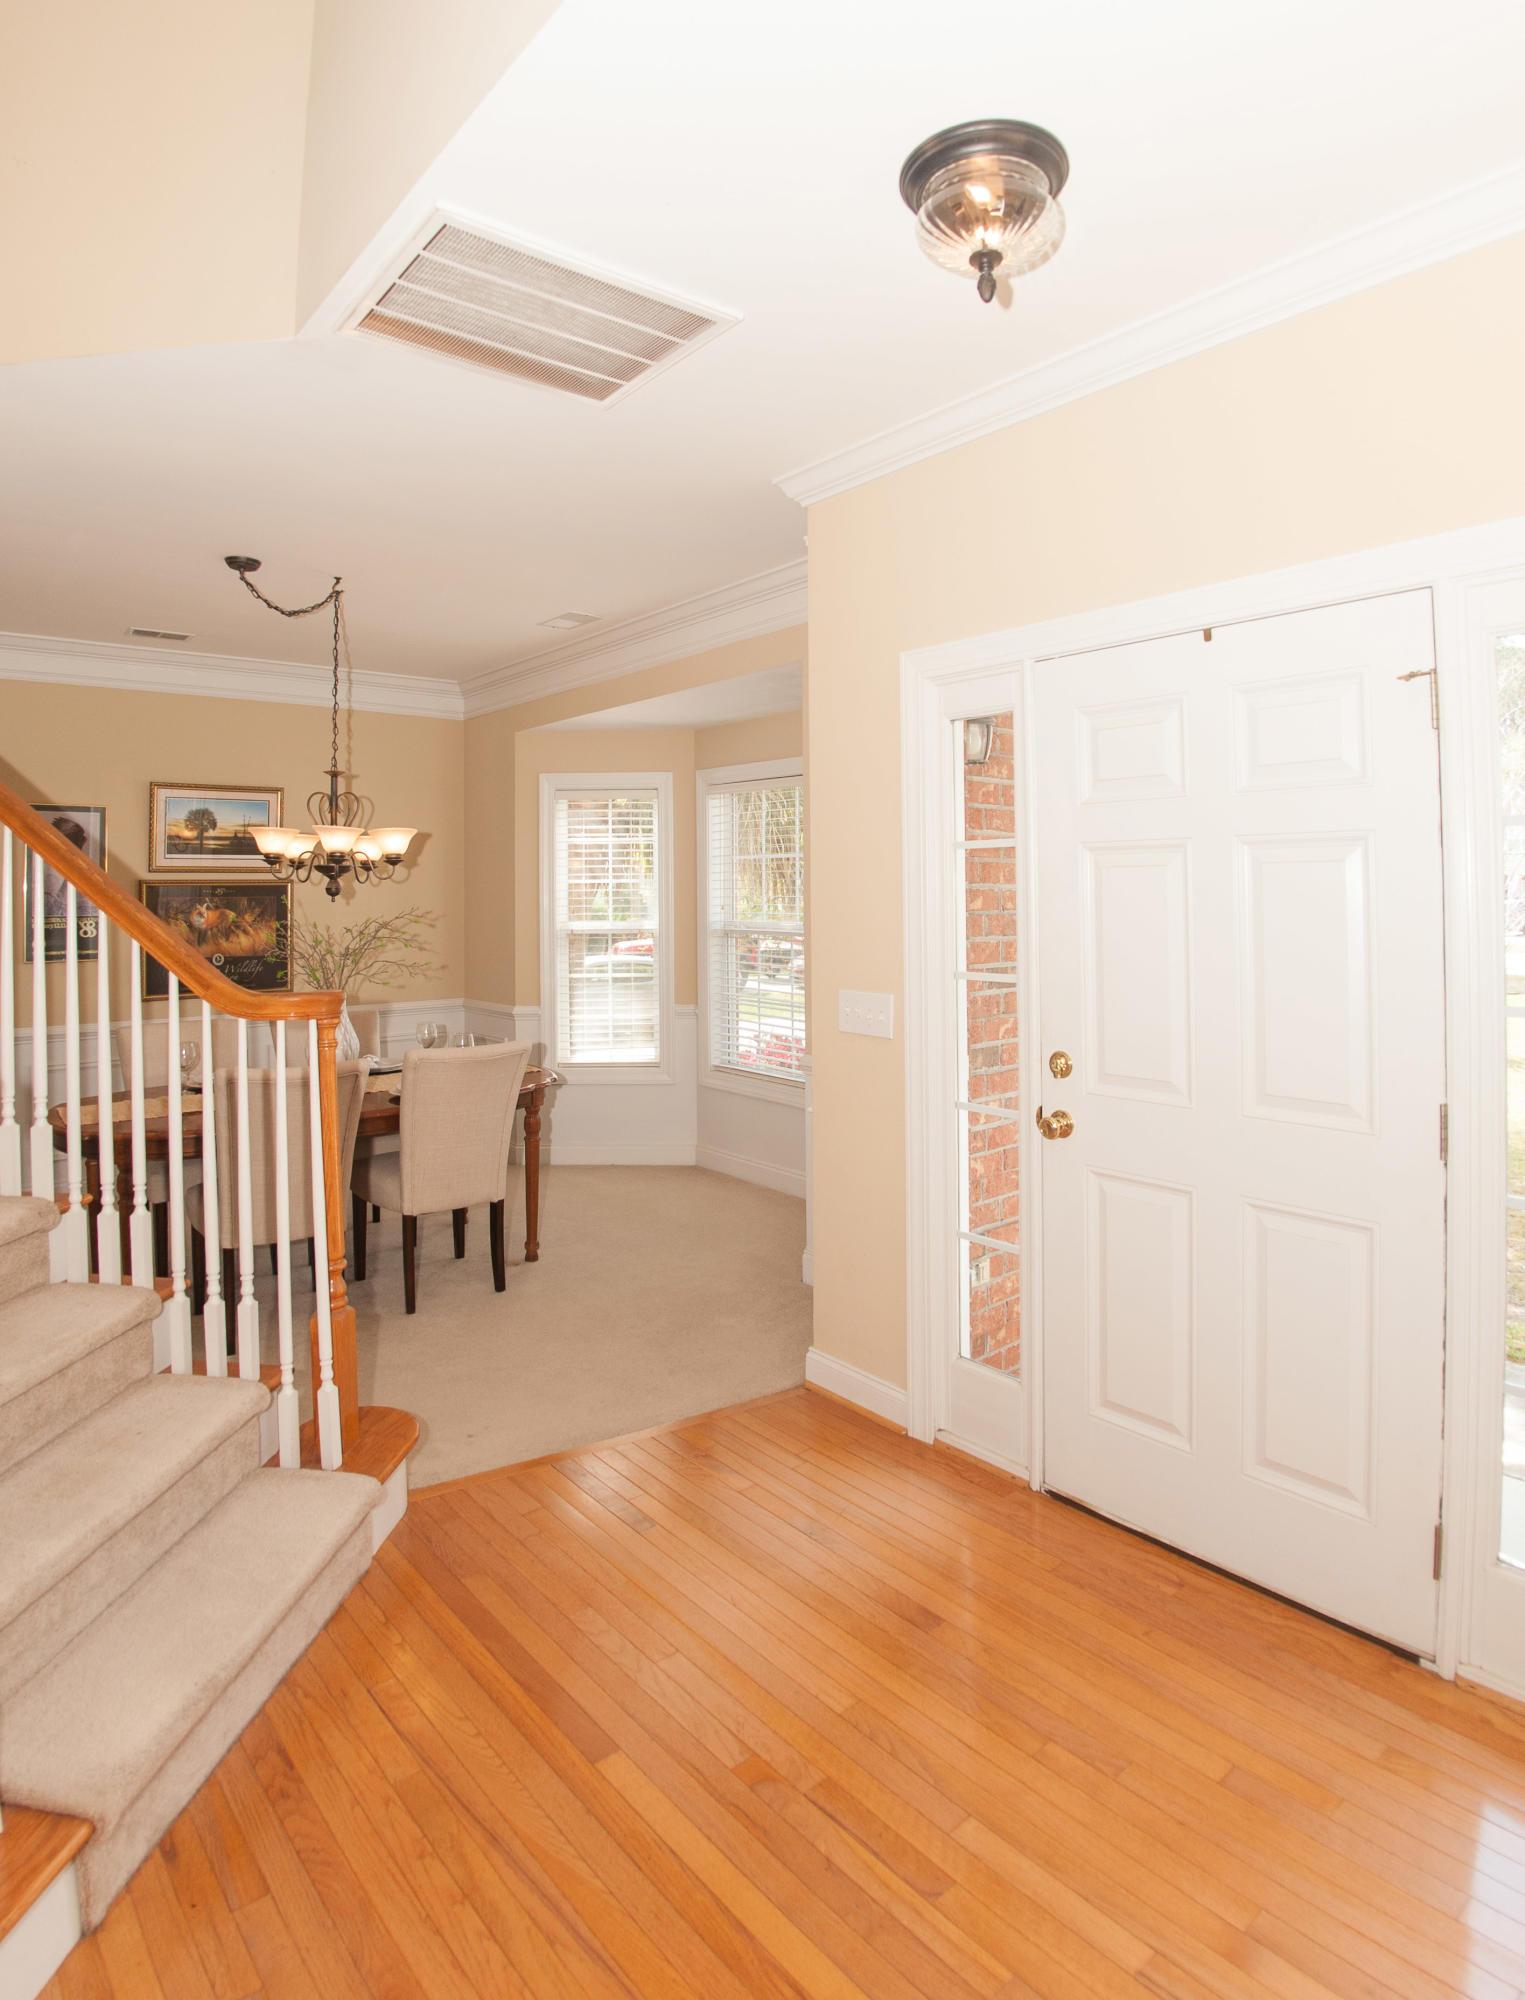 Dunes West Homes For Sale - 2520 Deer Walk, Mount Pleasant, SC - 11